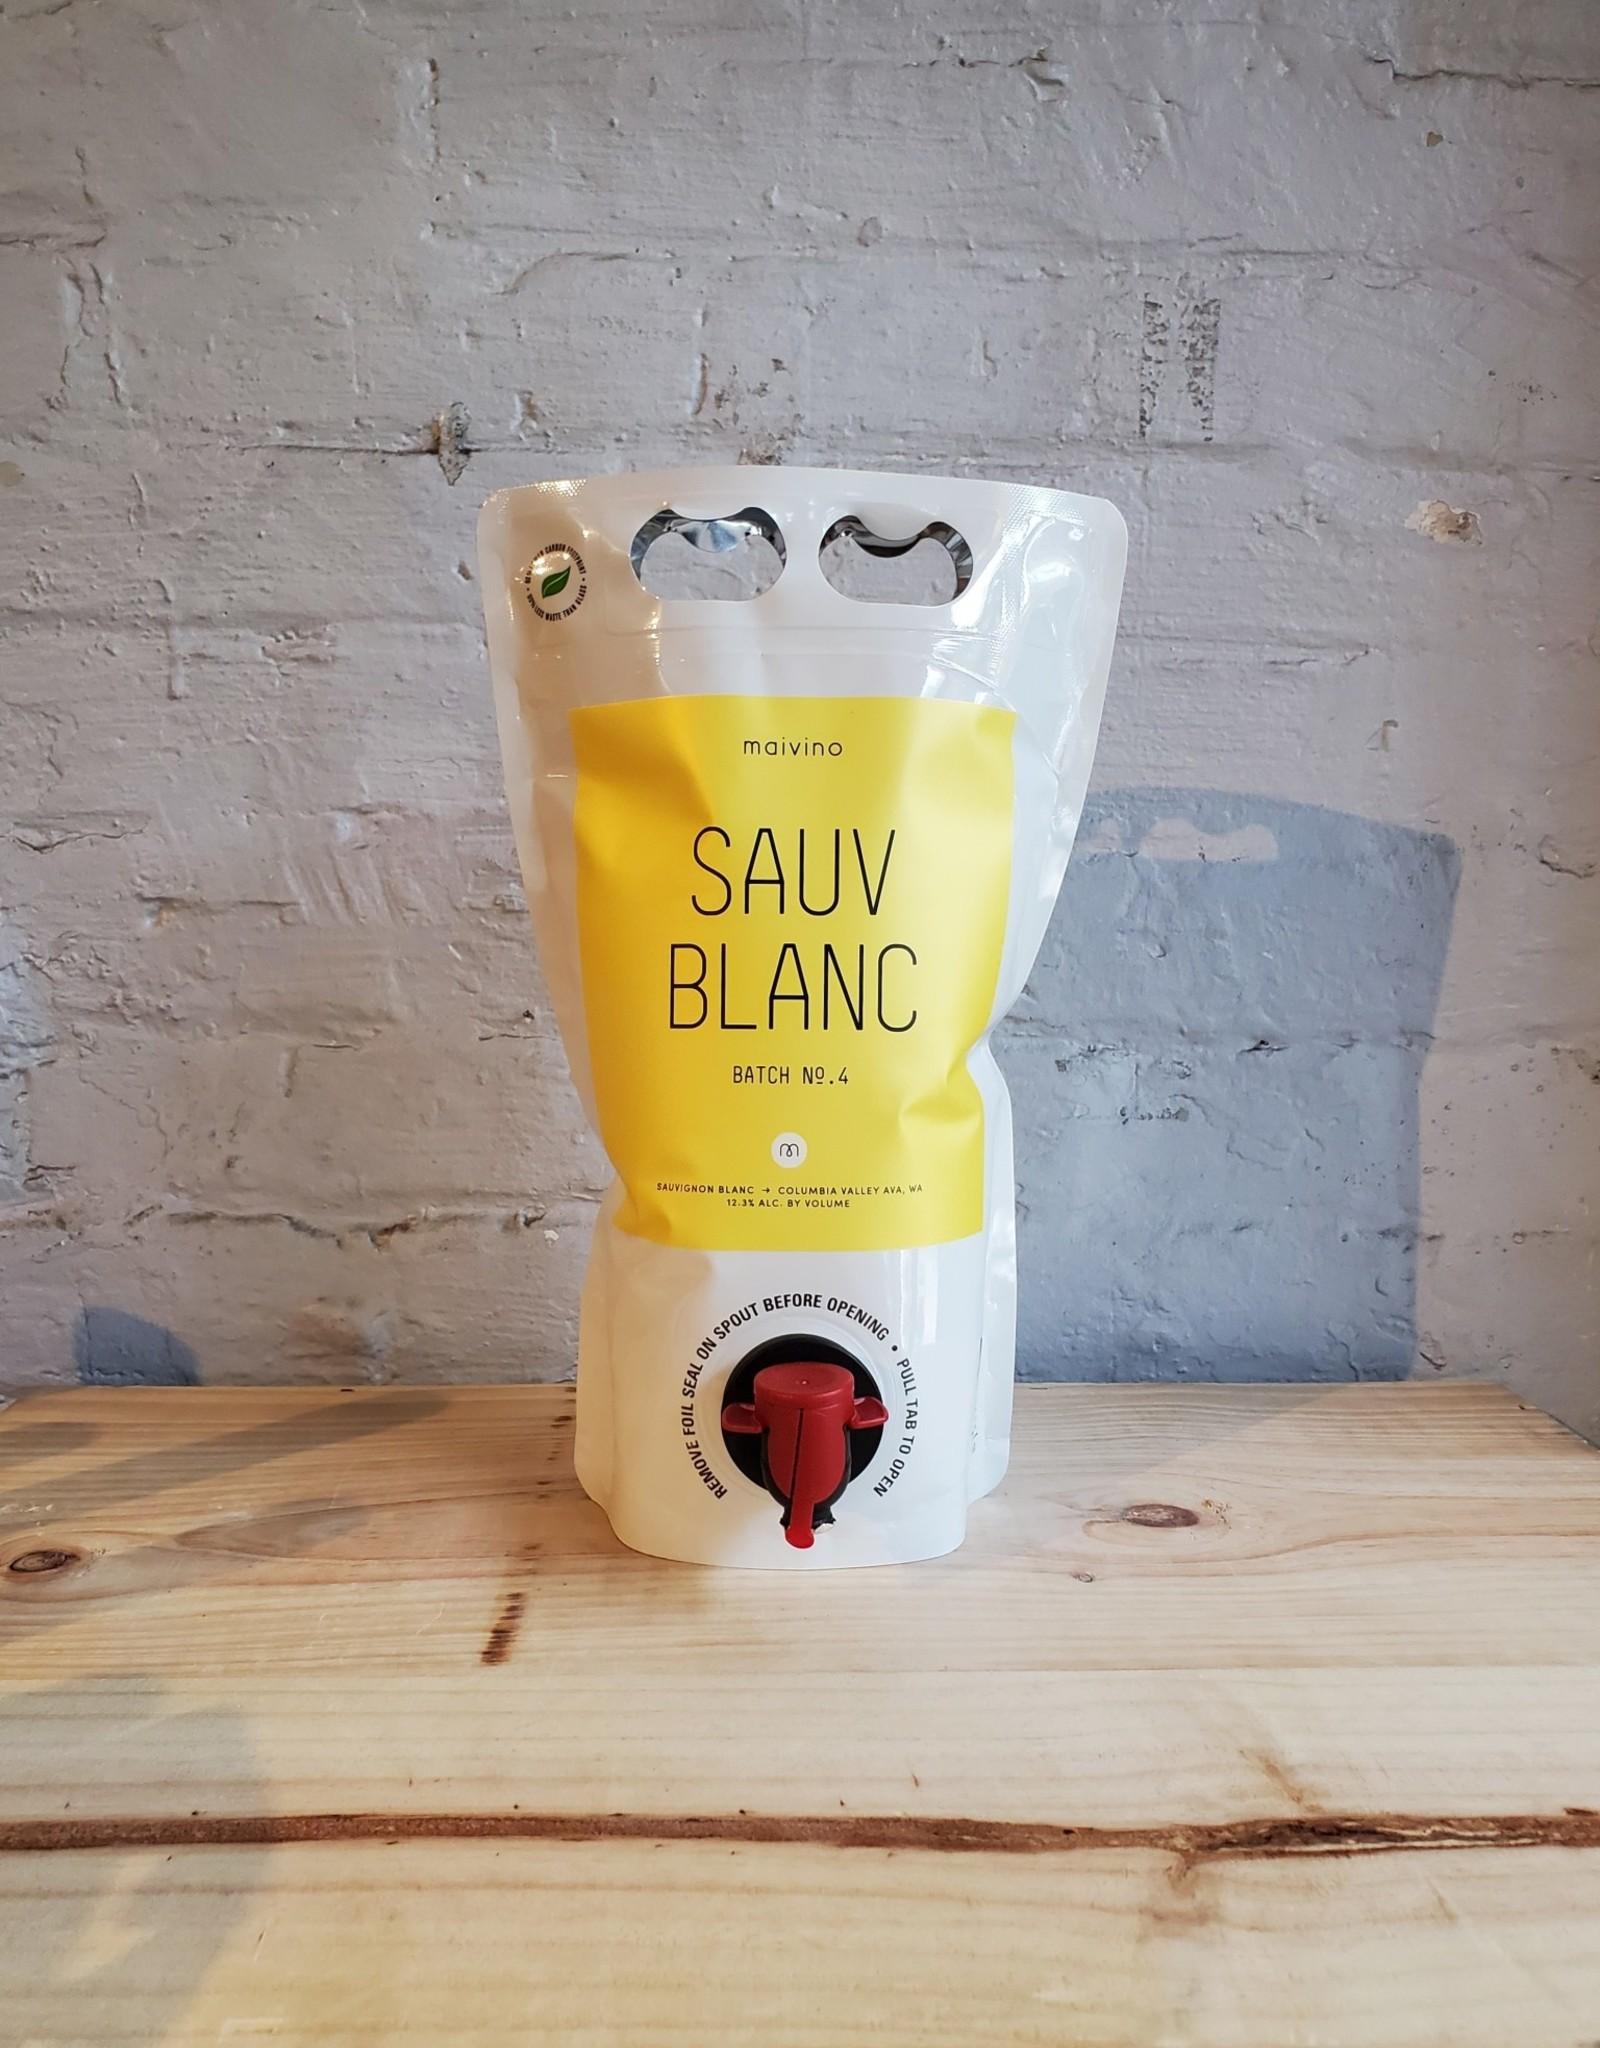 Wine NV Maivino Sauvignon Blanc Batch No. 4 - Columbia Valley, WA (1.5 L Bag)